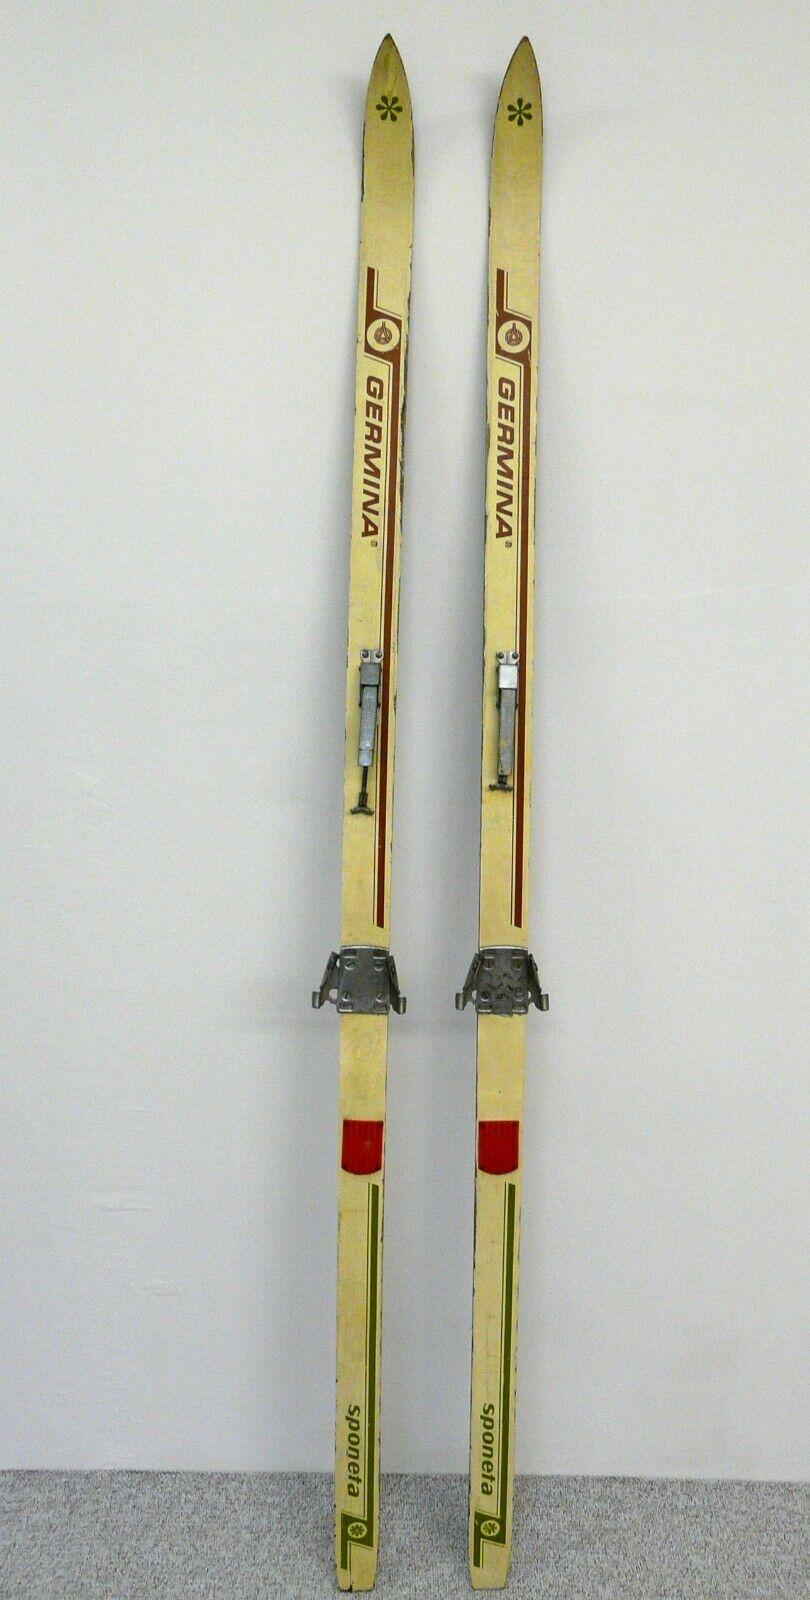 Kultige GERMINA GERMINA GERMINA Sponeta DDR Langlaufski 190 cm OBERHOF Bindung Ski Skier RETRO 3683a0